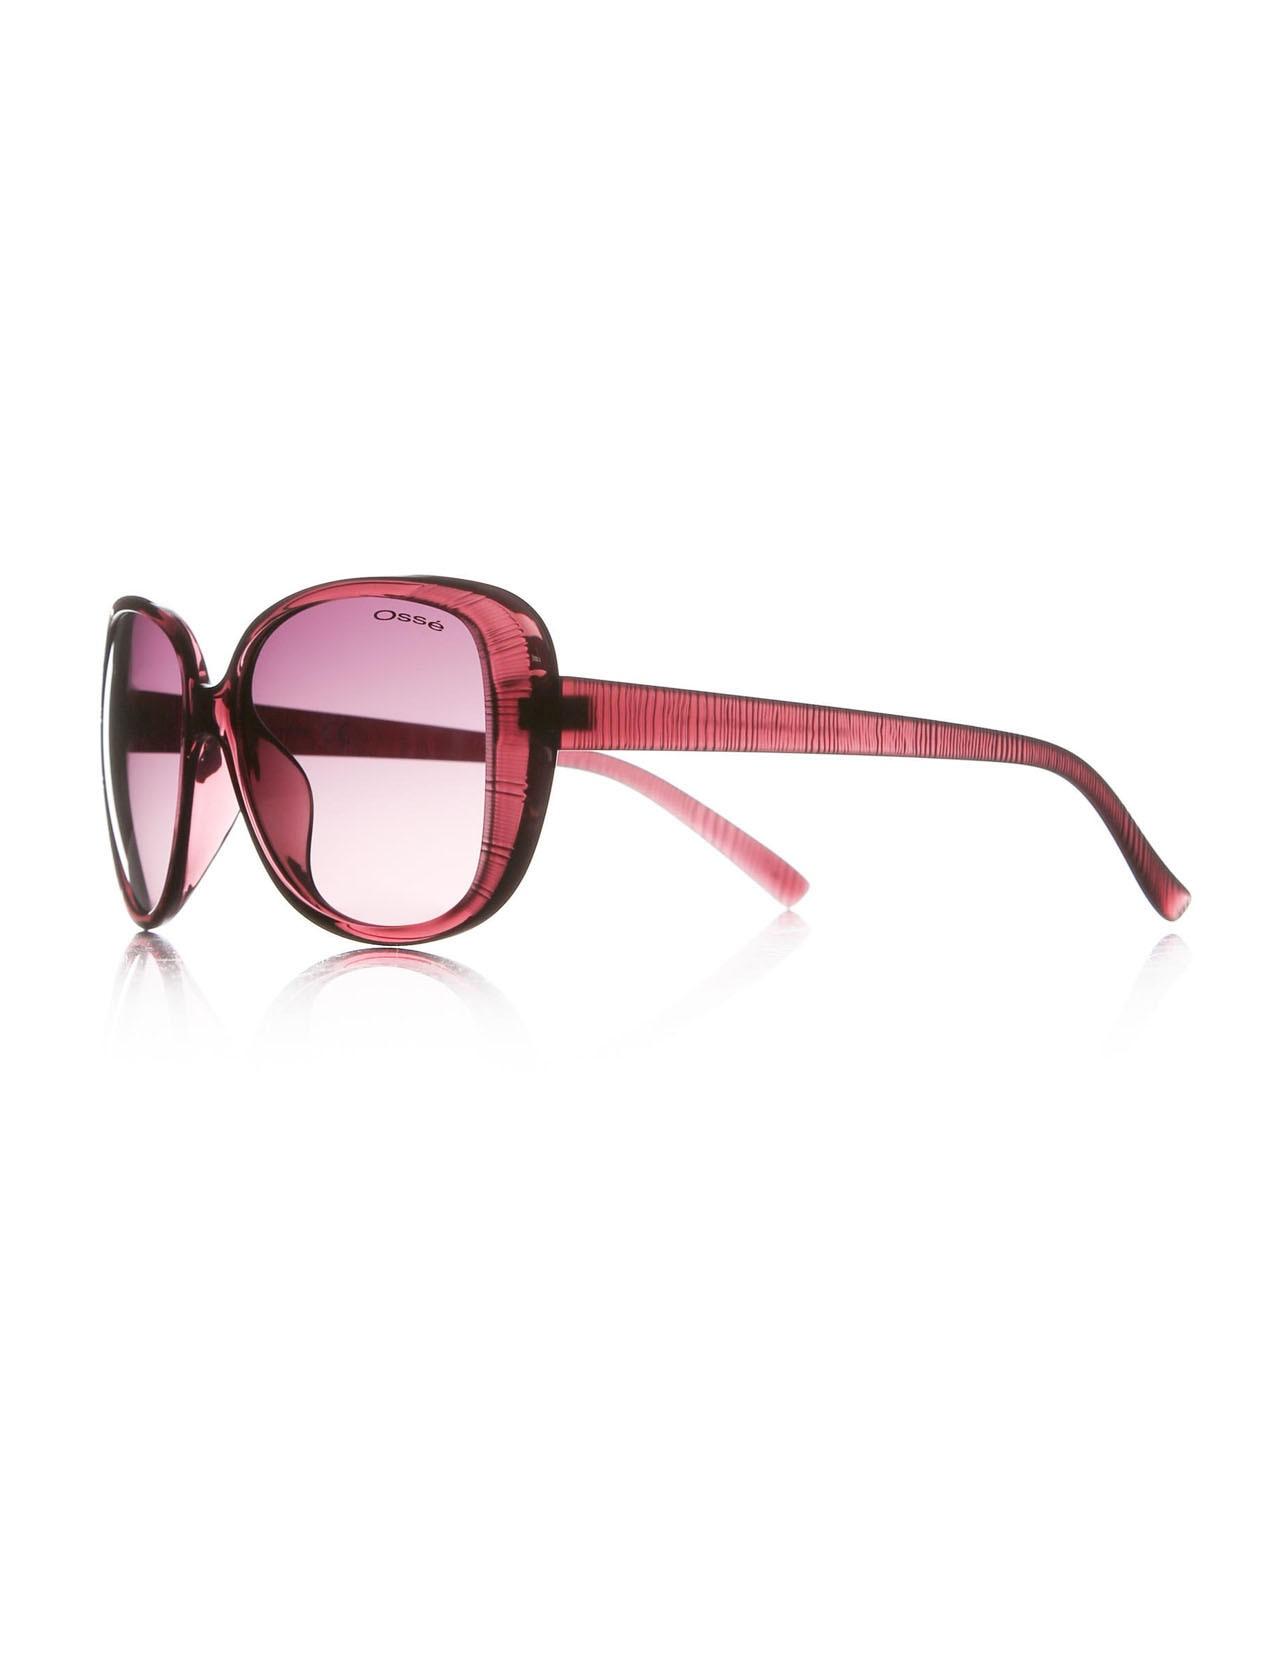 Women's sunglasses os 1728 02 bone purple organic oval aval 56-15-141 osse